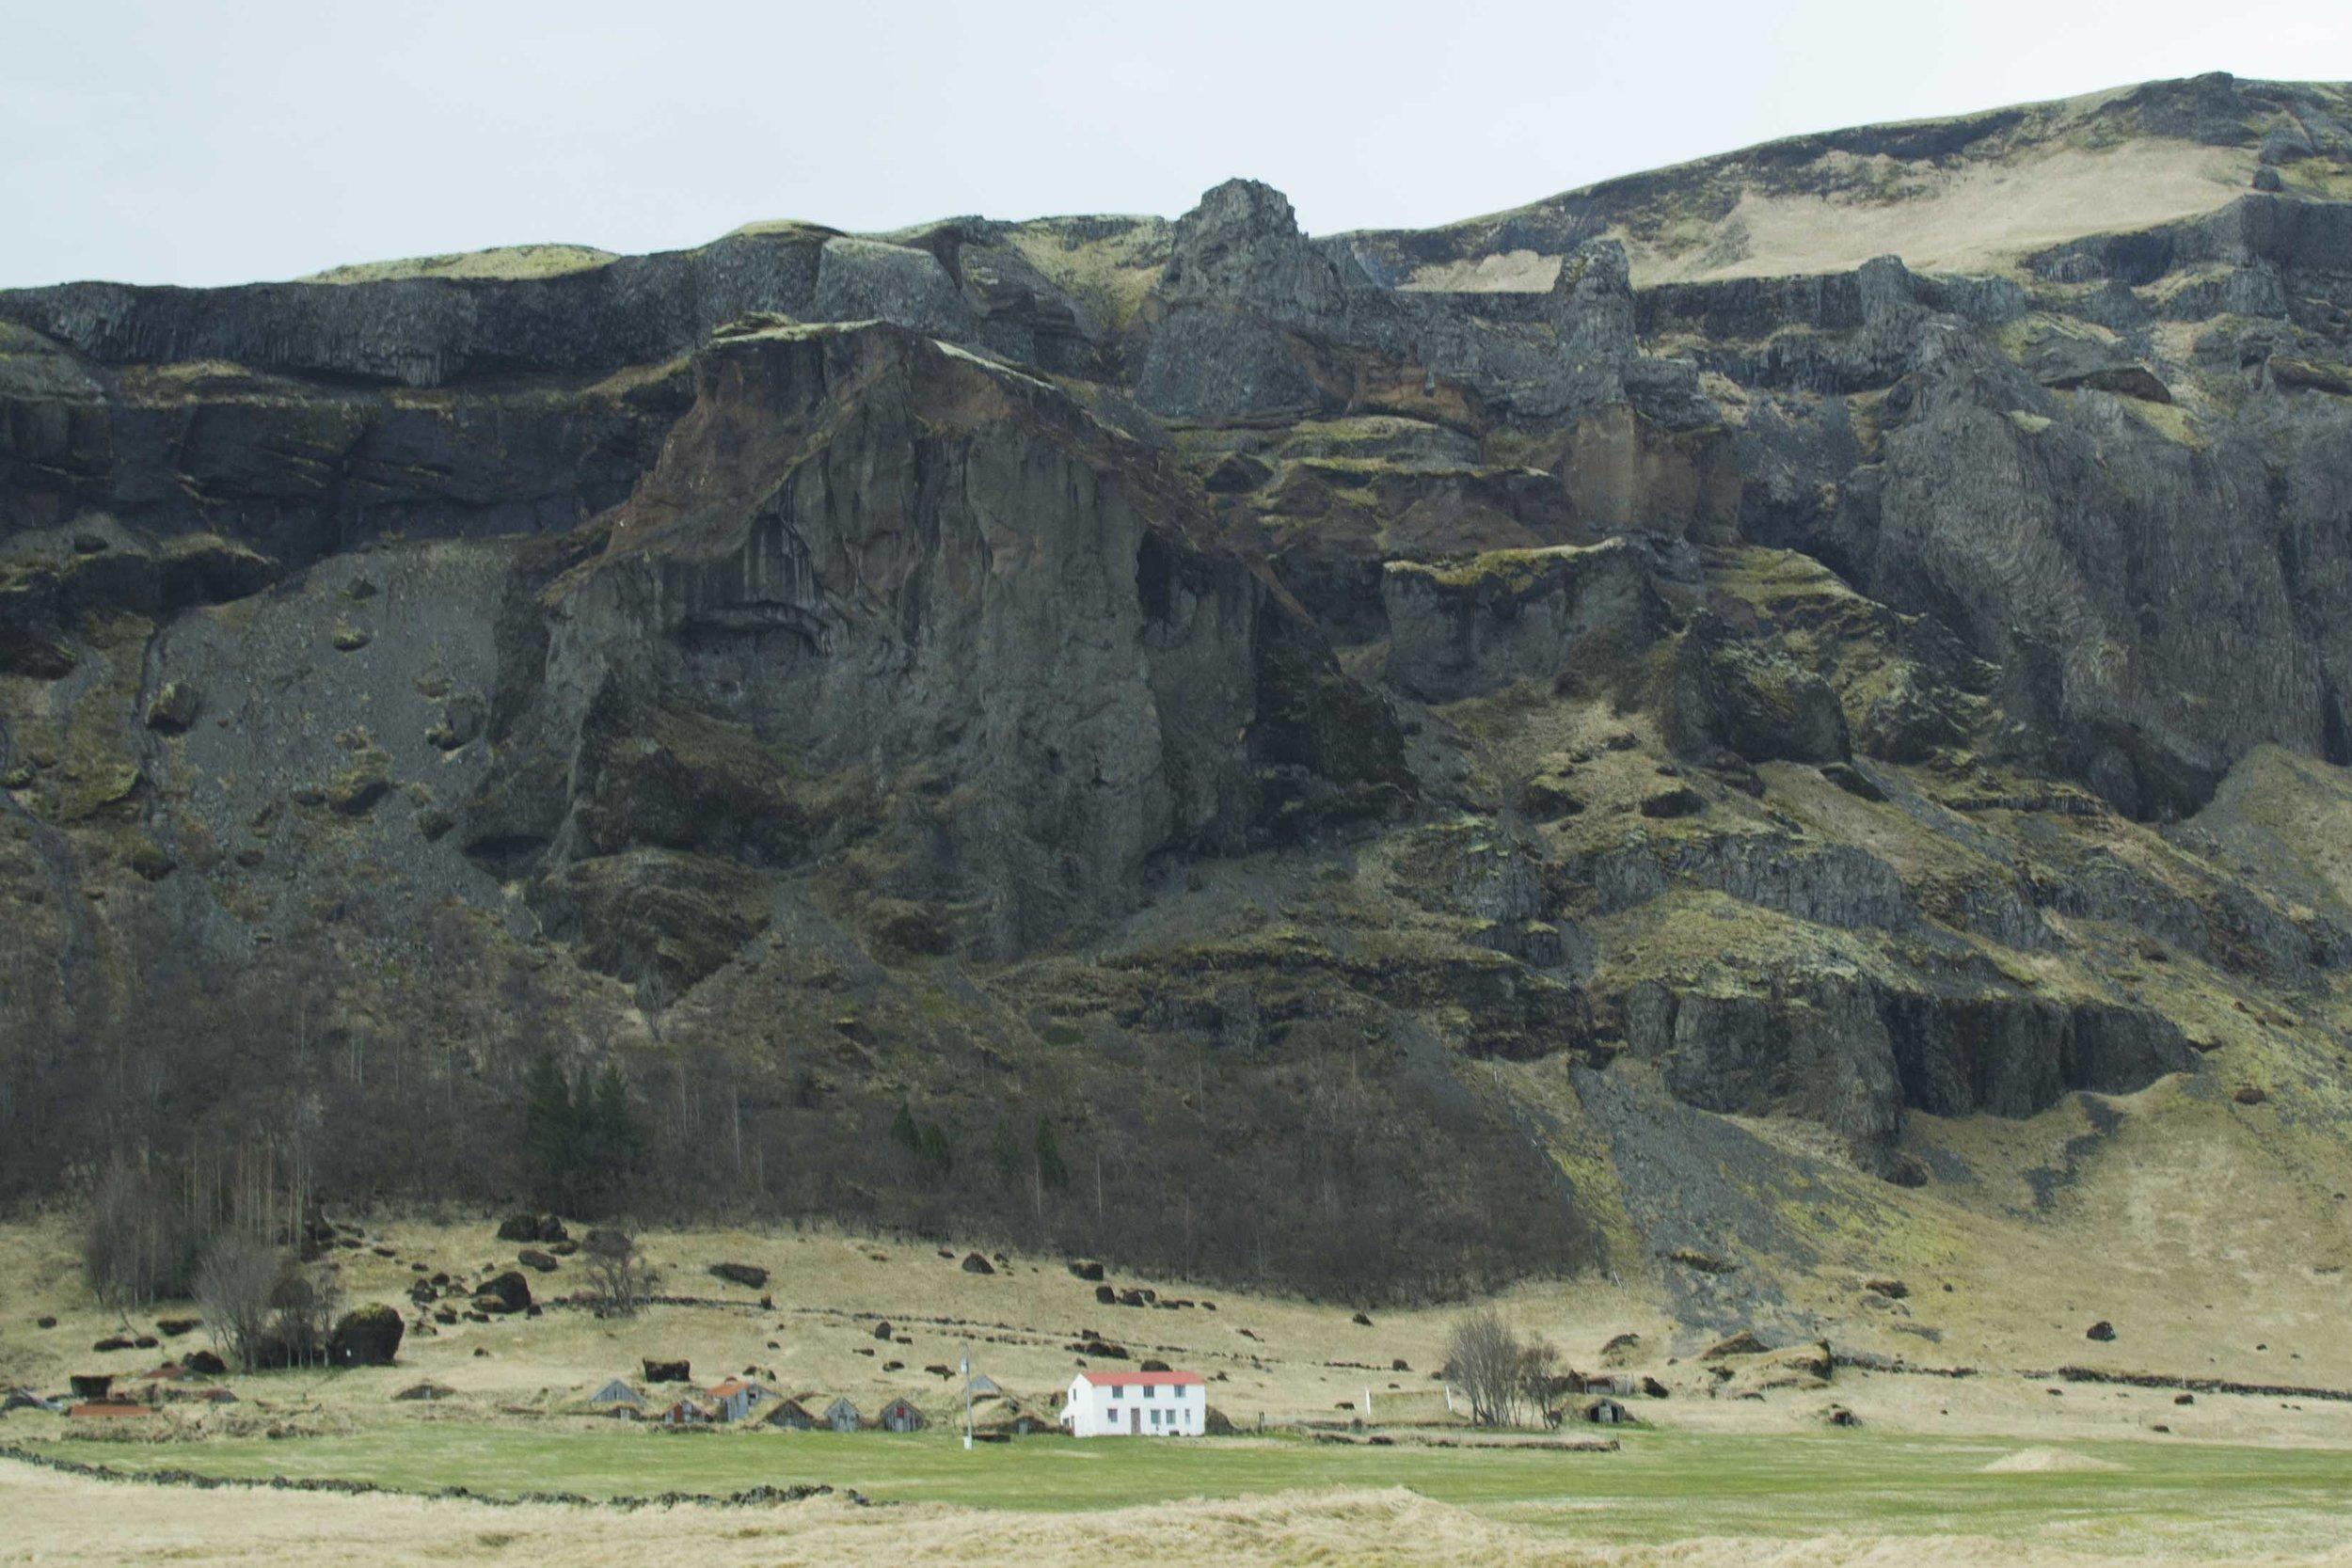 Iceland_2017_ (133 of 162)_Crop2.jpg